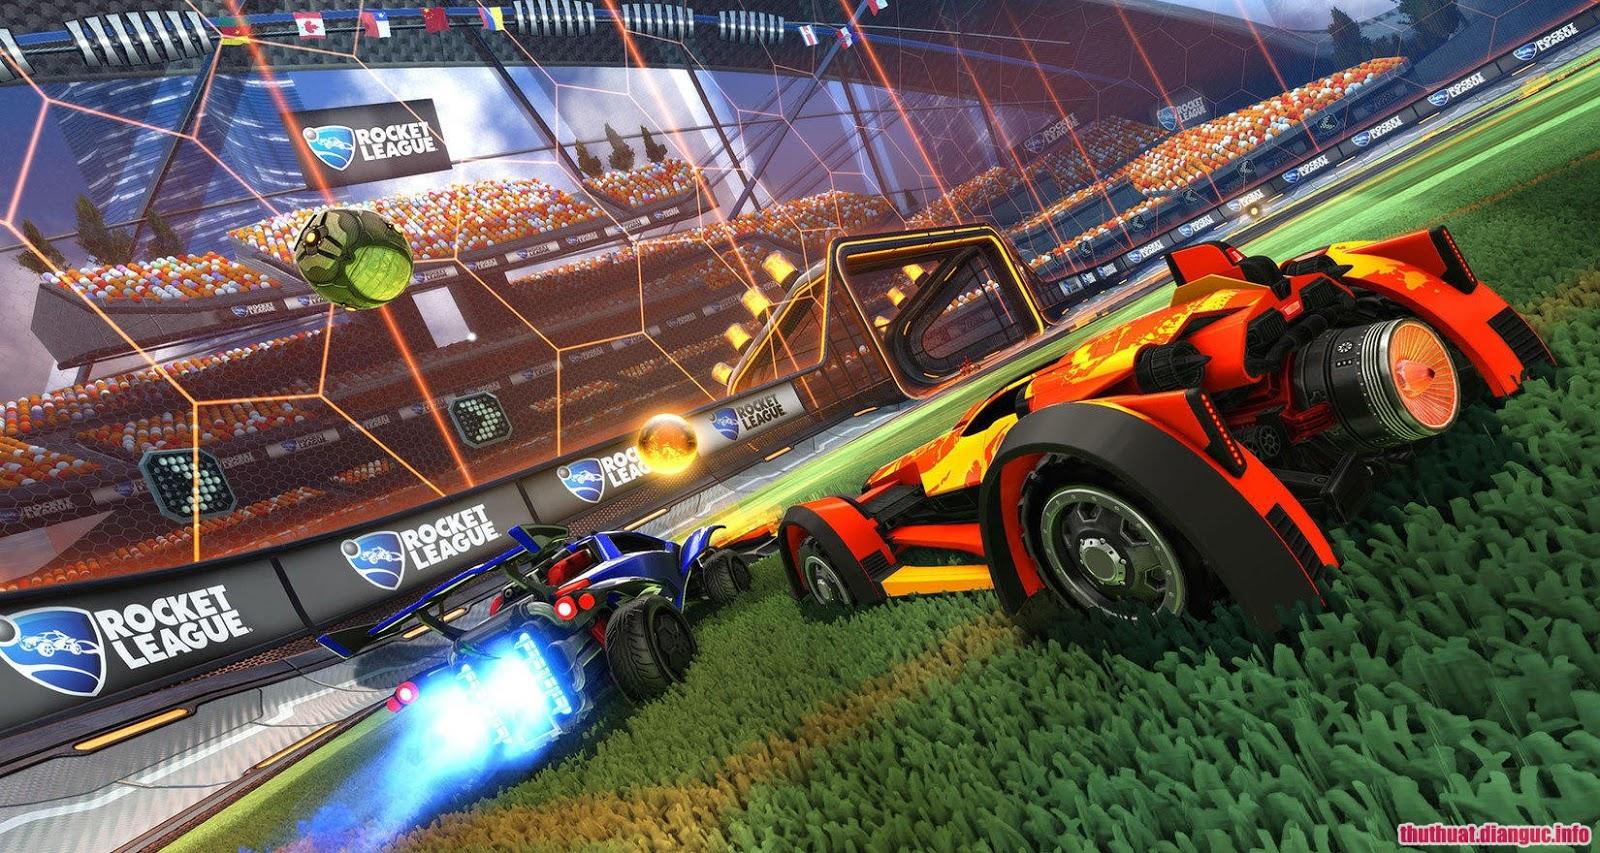 Tải game Rocket League miễn phí